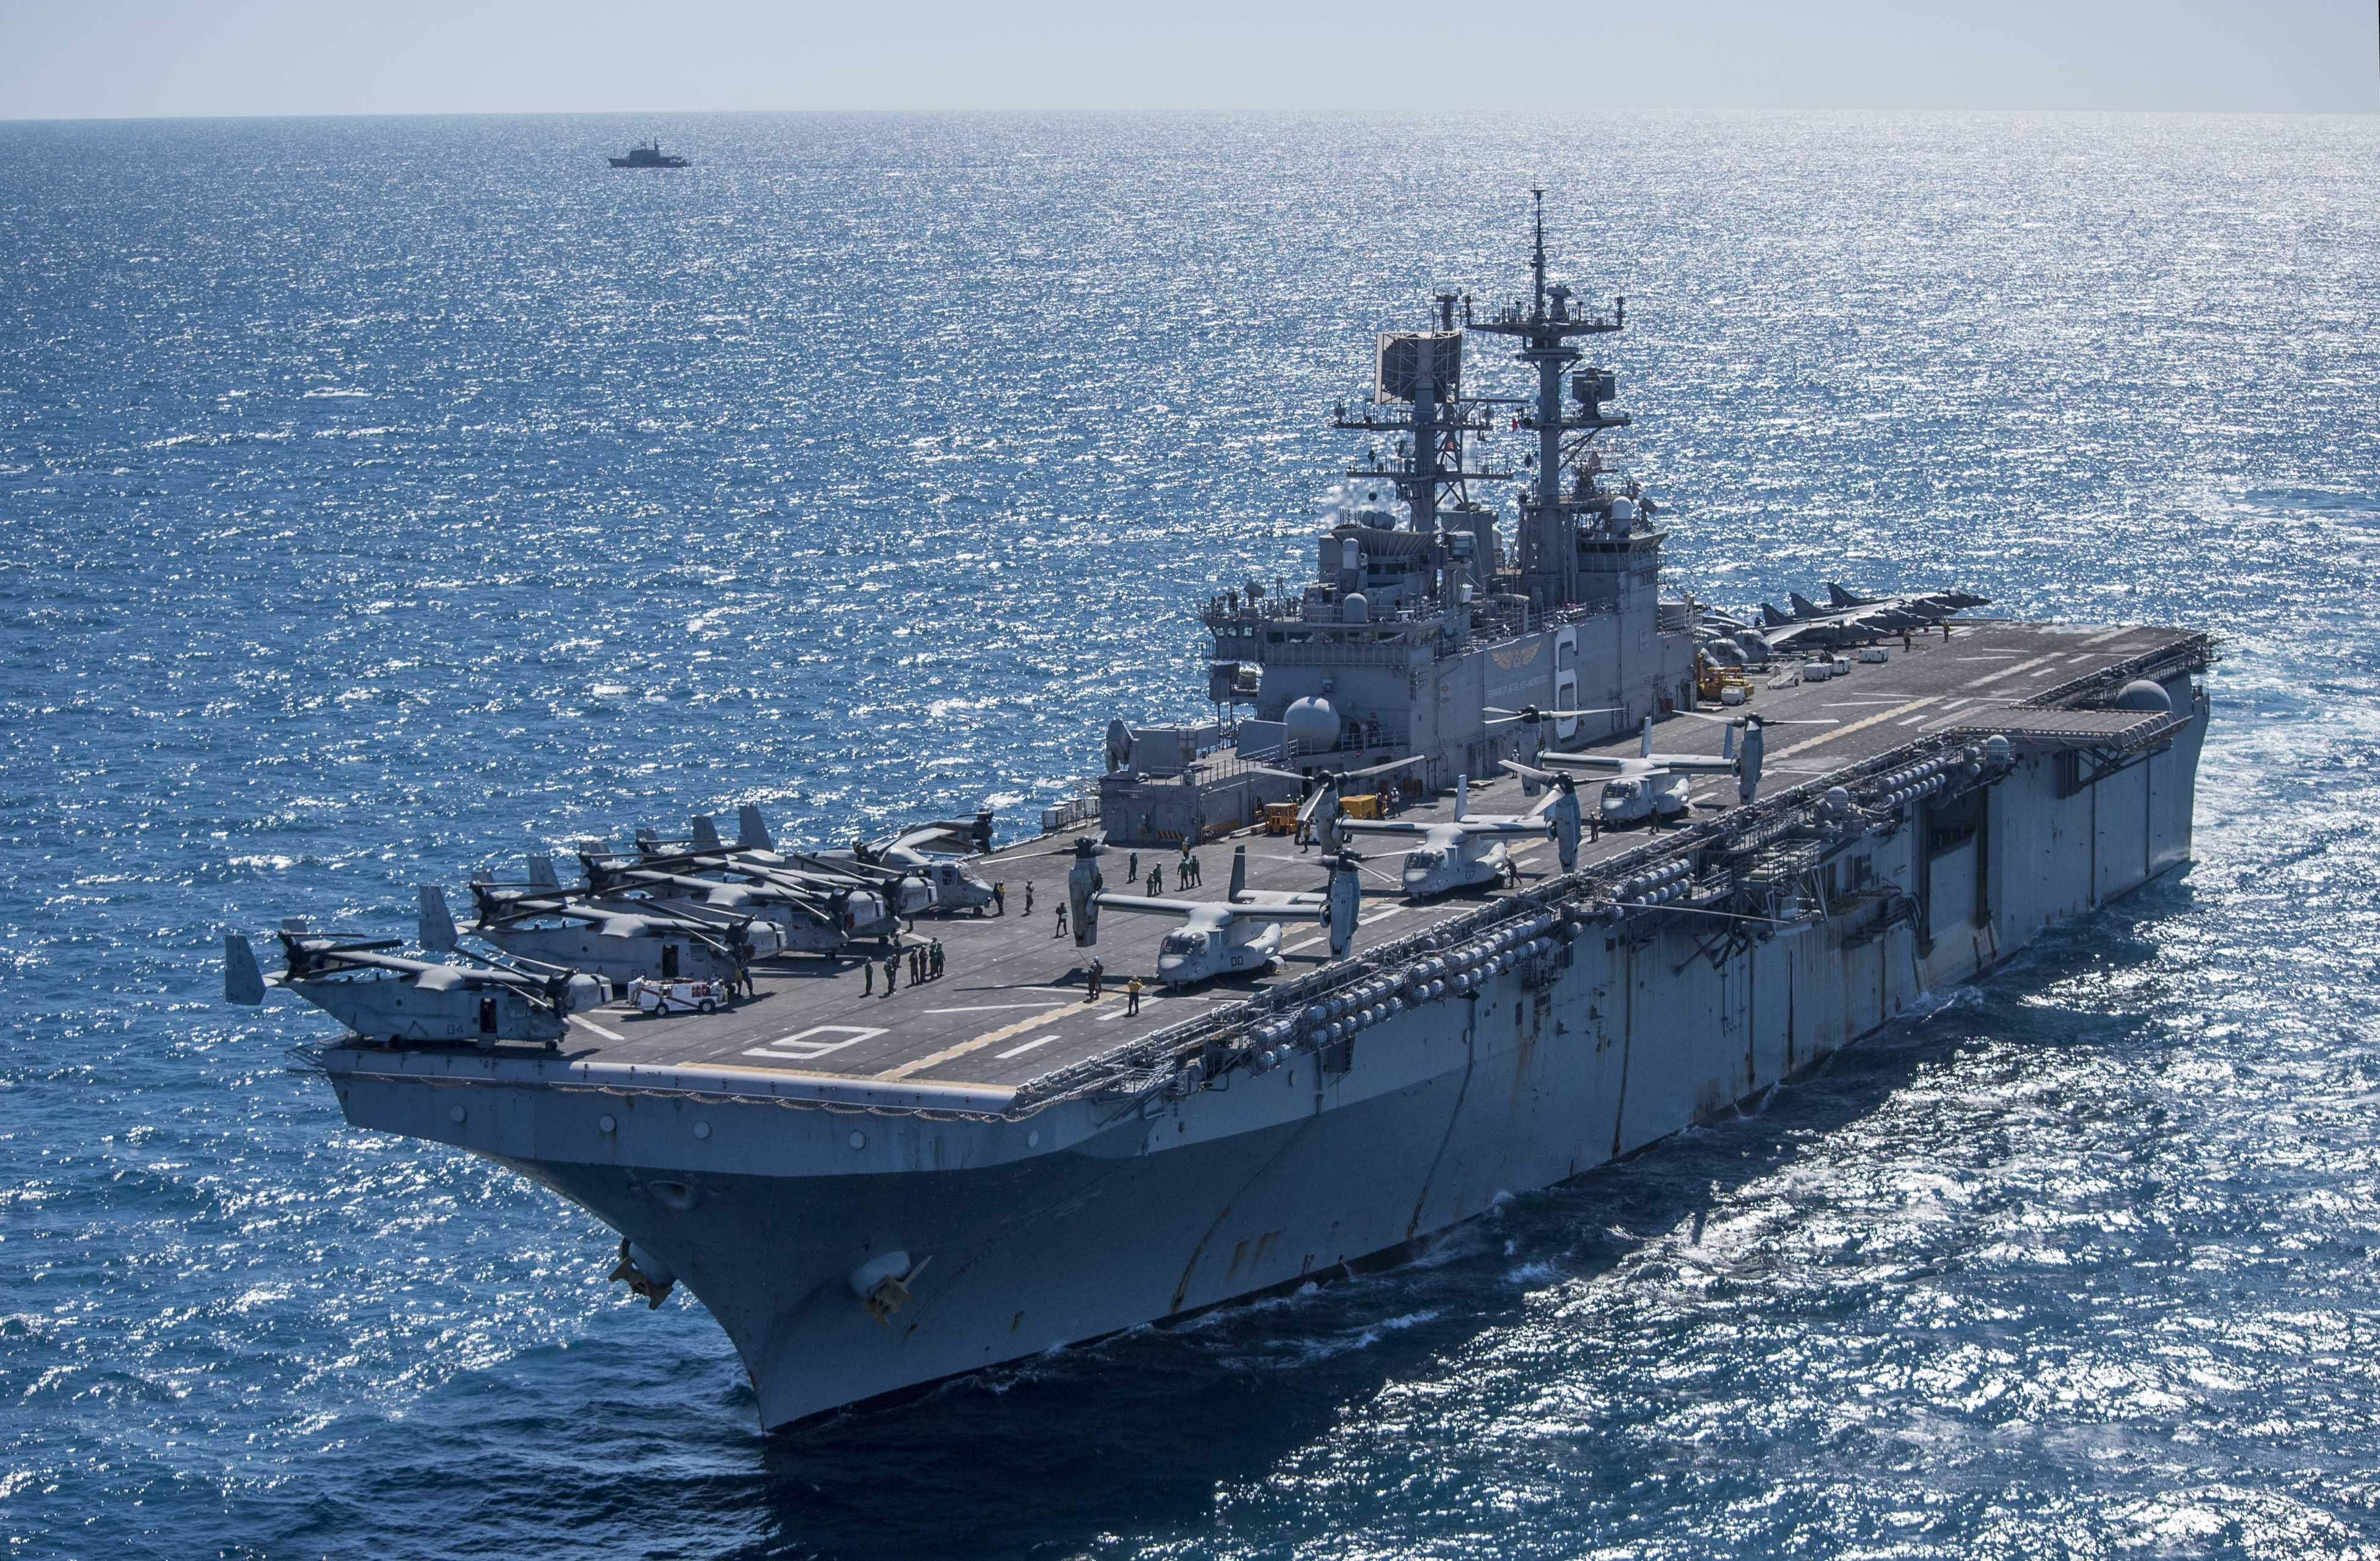 USS_Bonhomme_Richard_transits_near_the_R